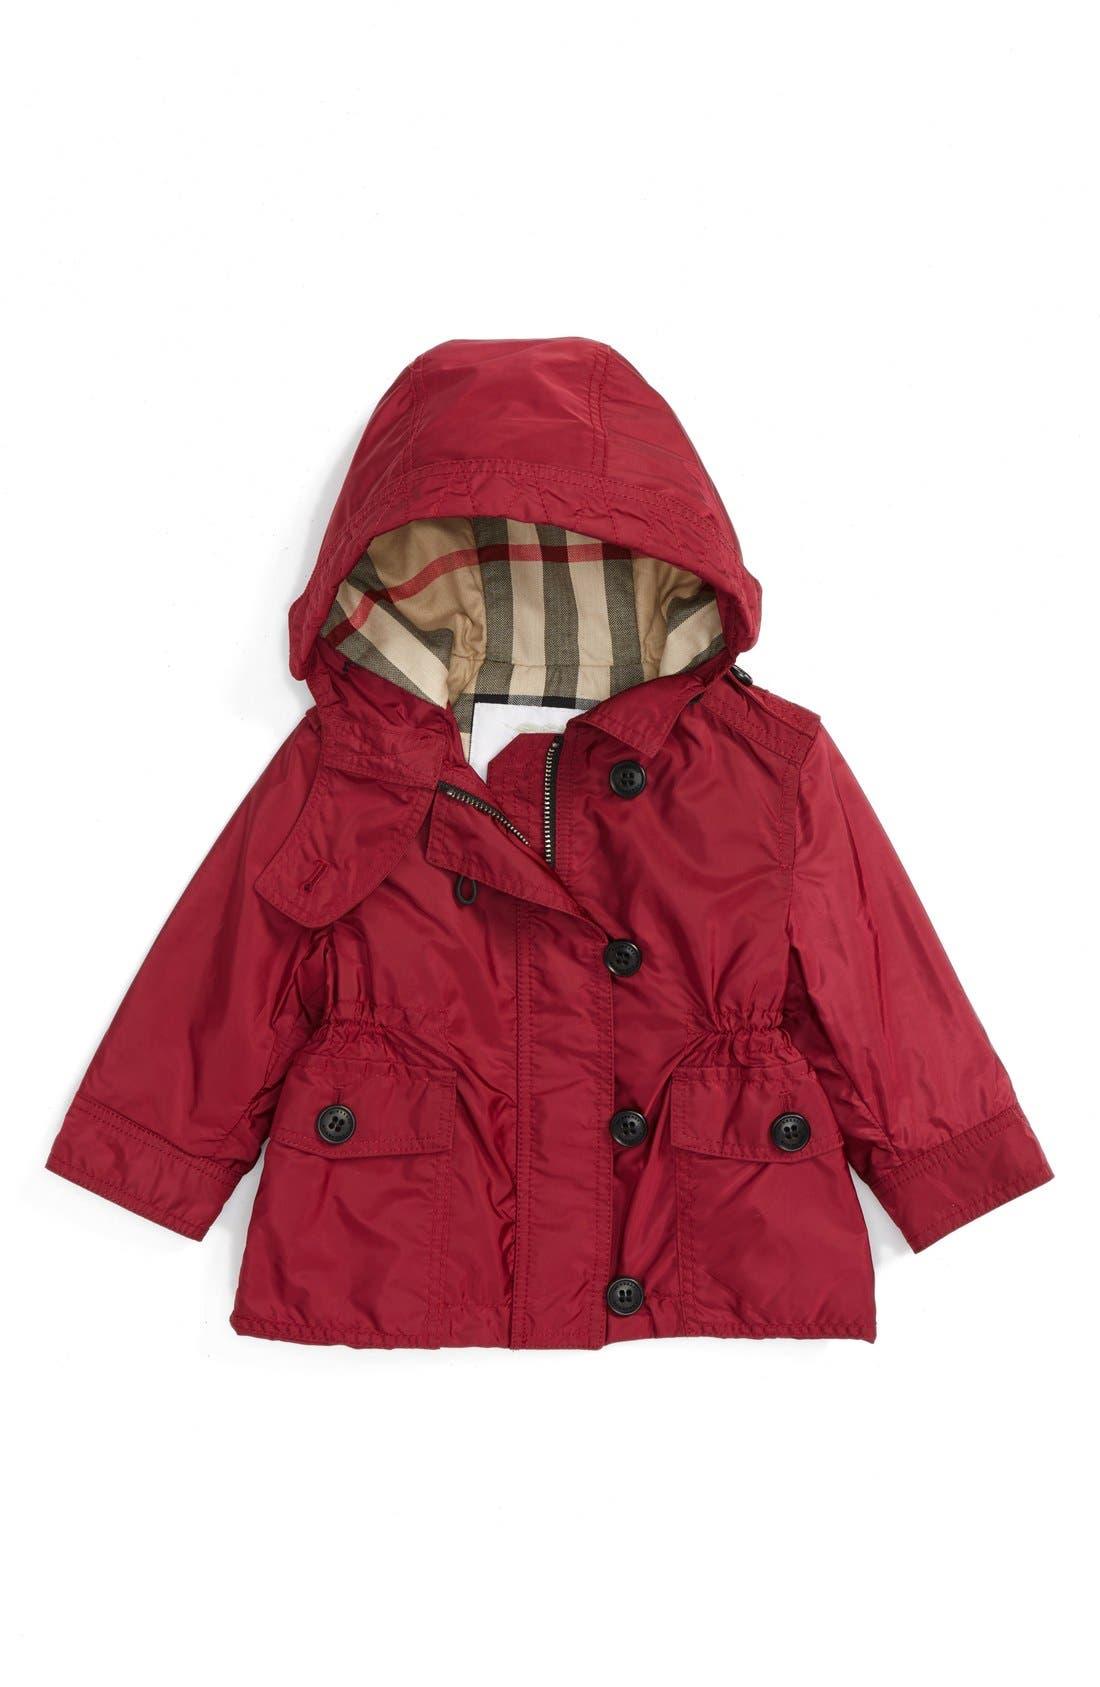 Alternate Image 1 Selected - Burberry 'Karen' Hooded Jacket (Baby Girls)